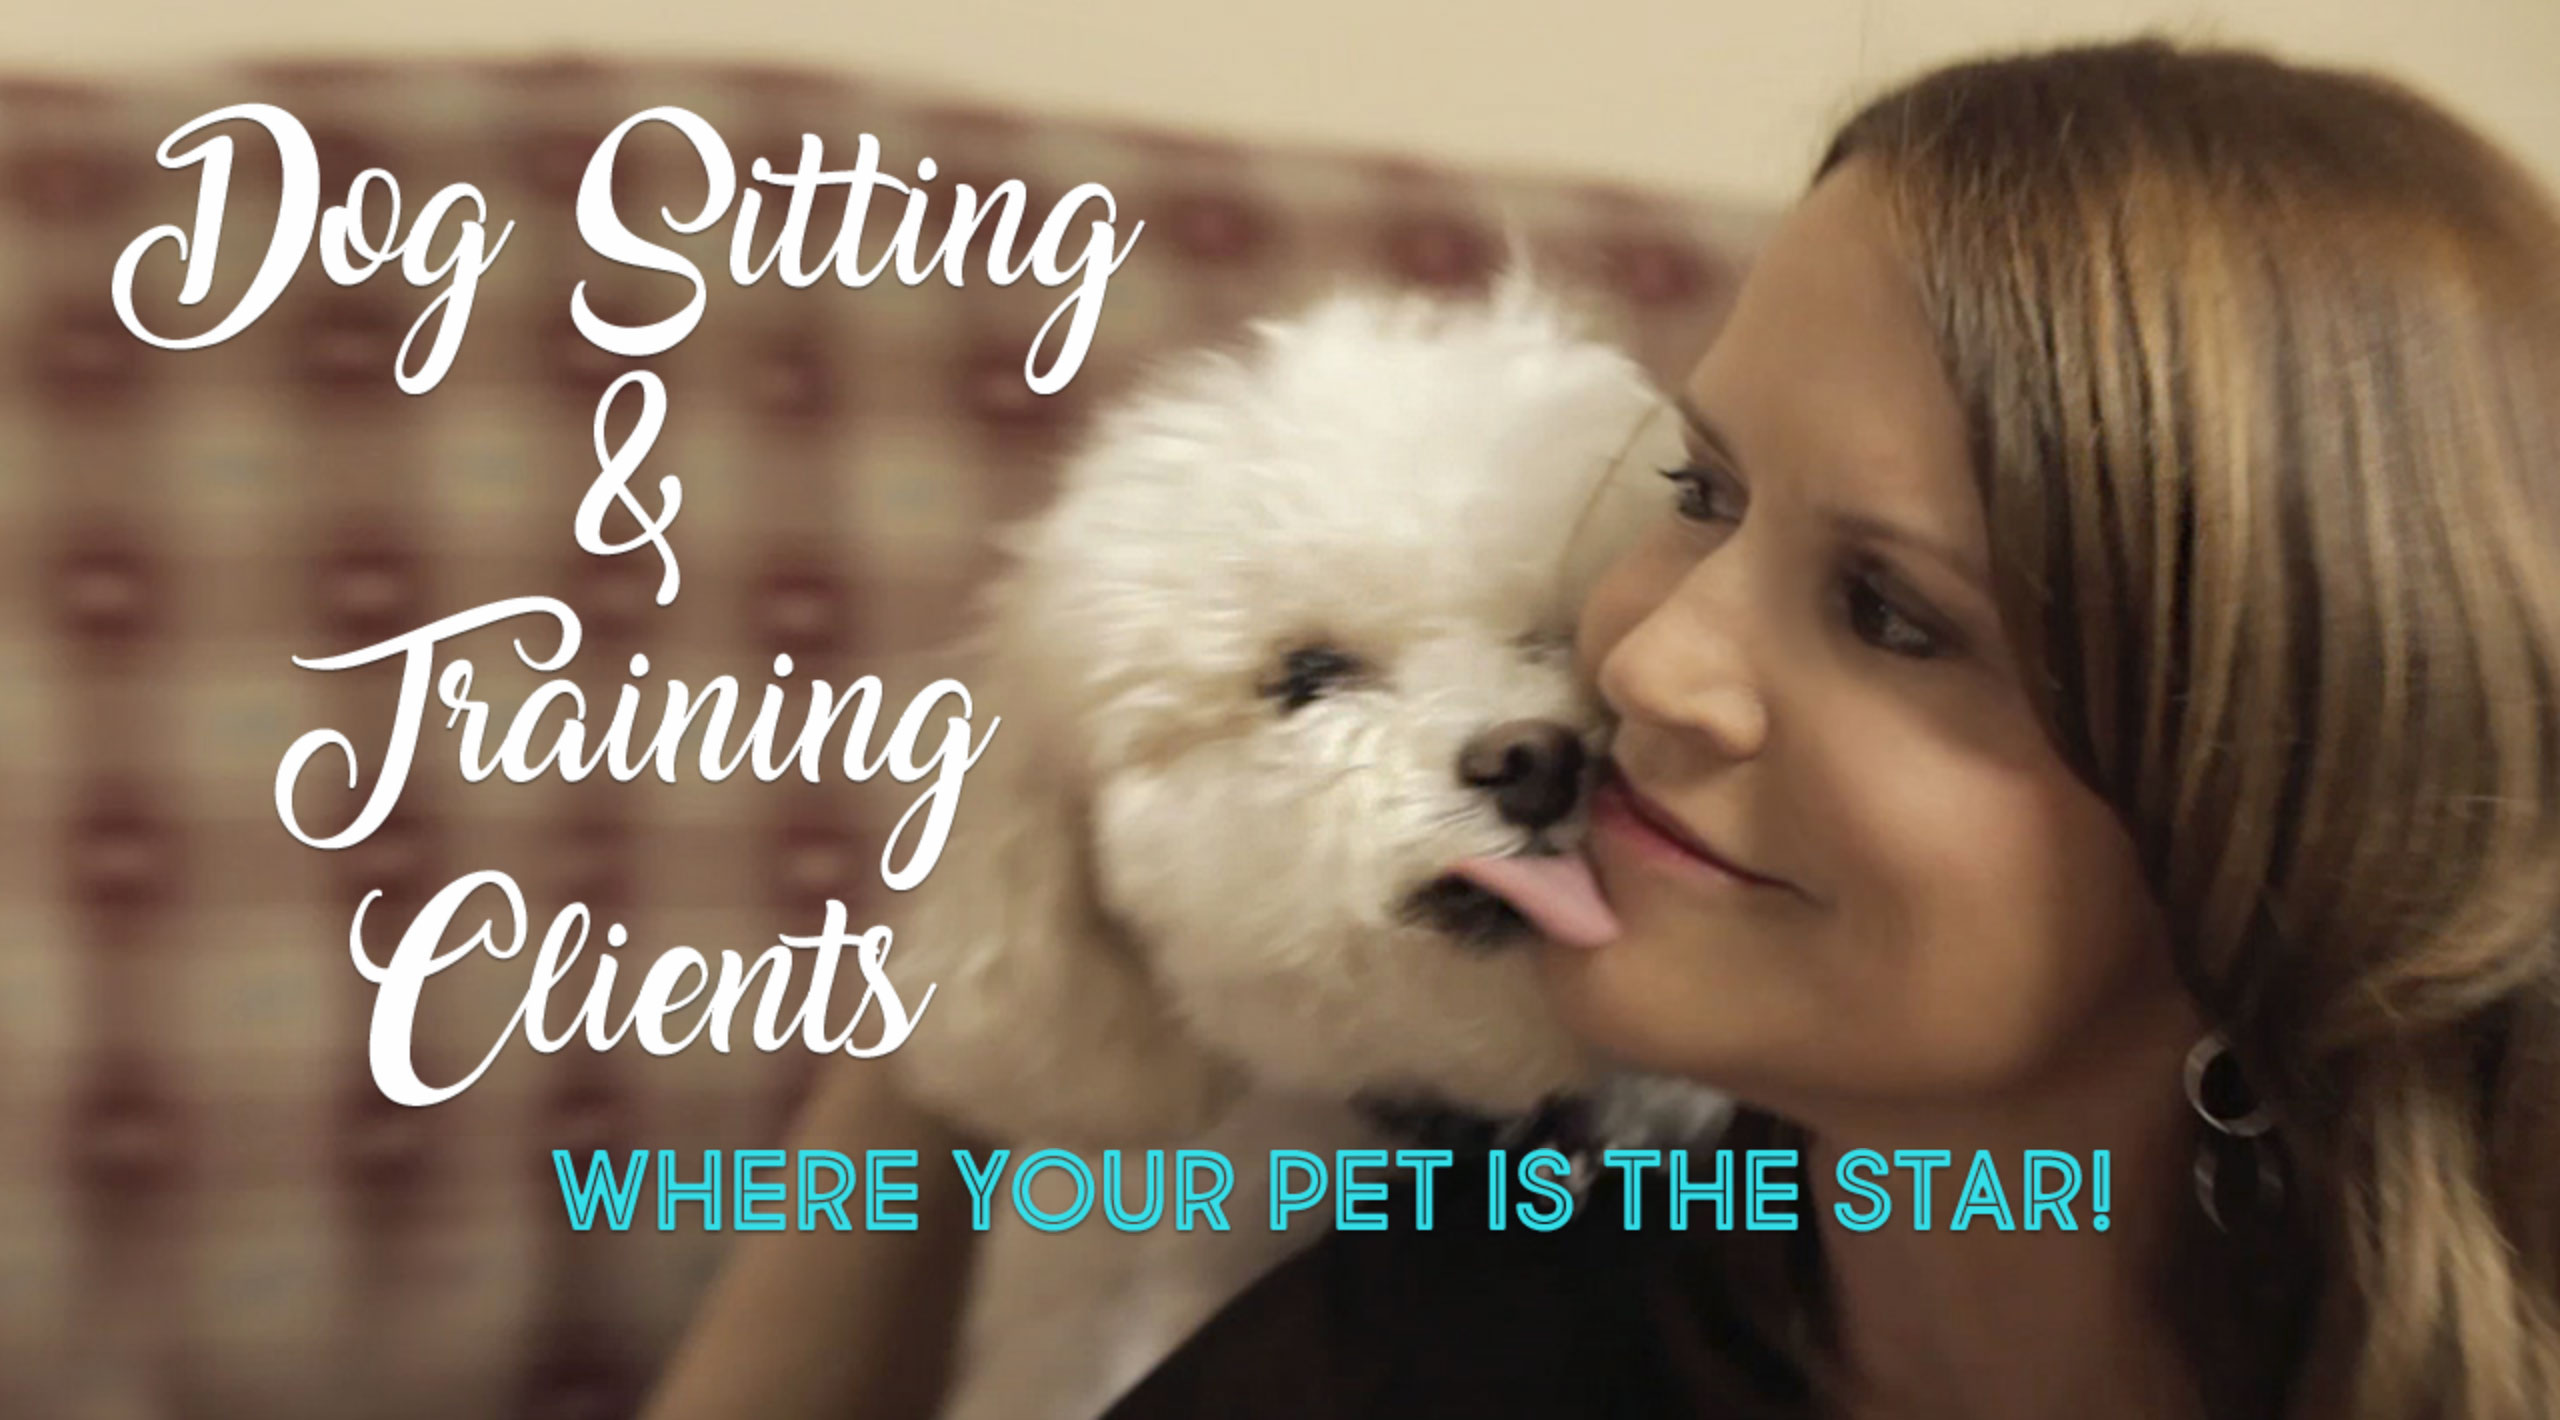 Dog Sitting & Training Clients